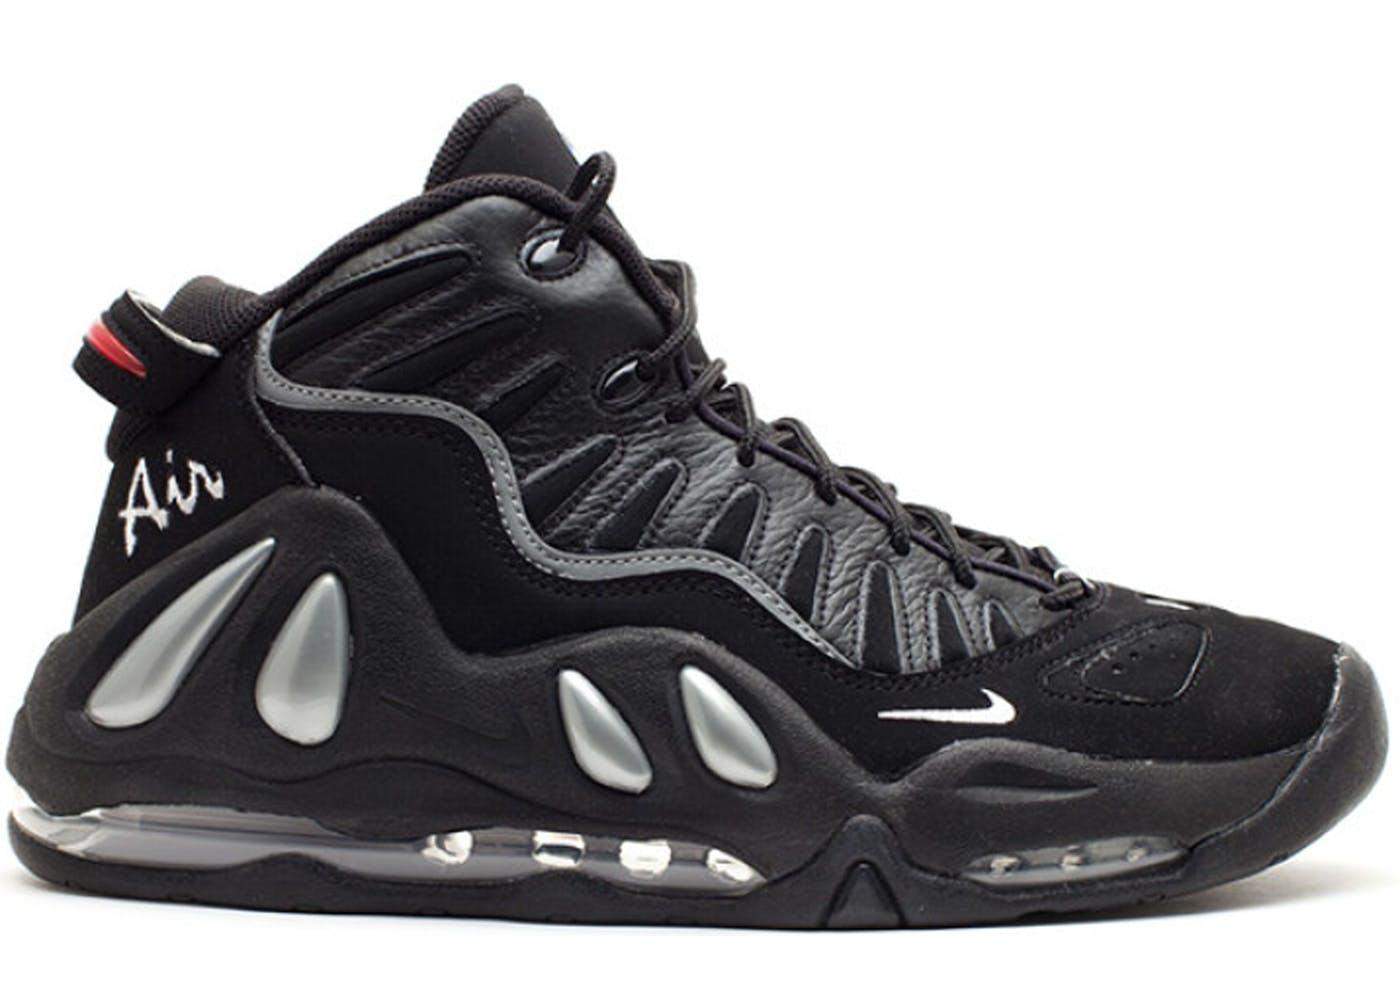 Nike Air Uptempo 97 Black